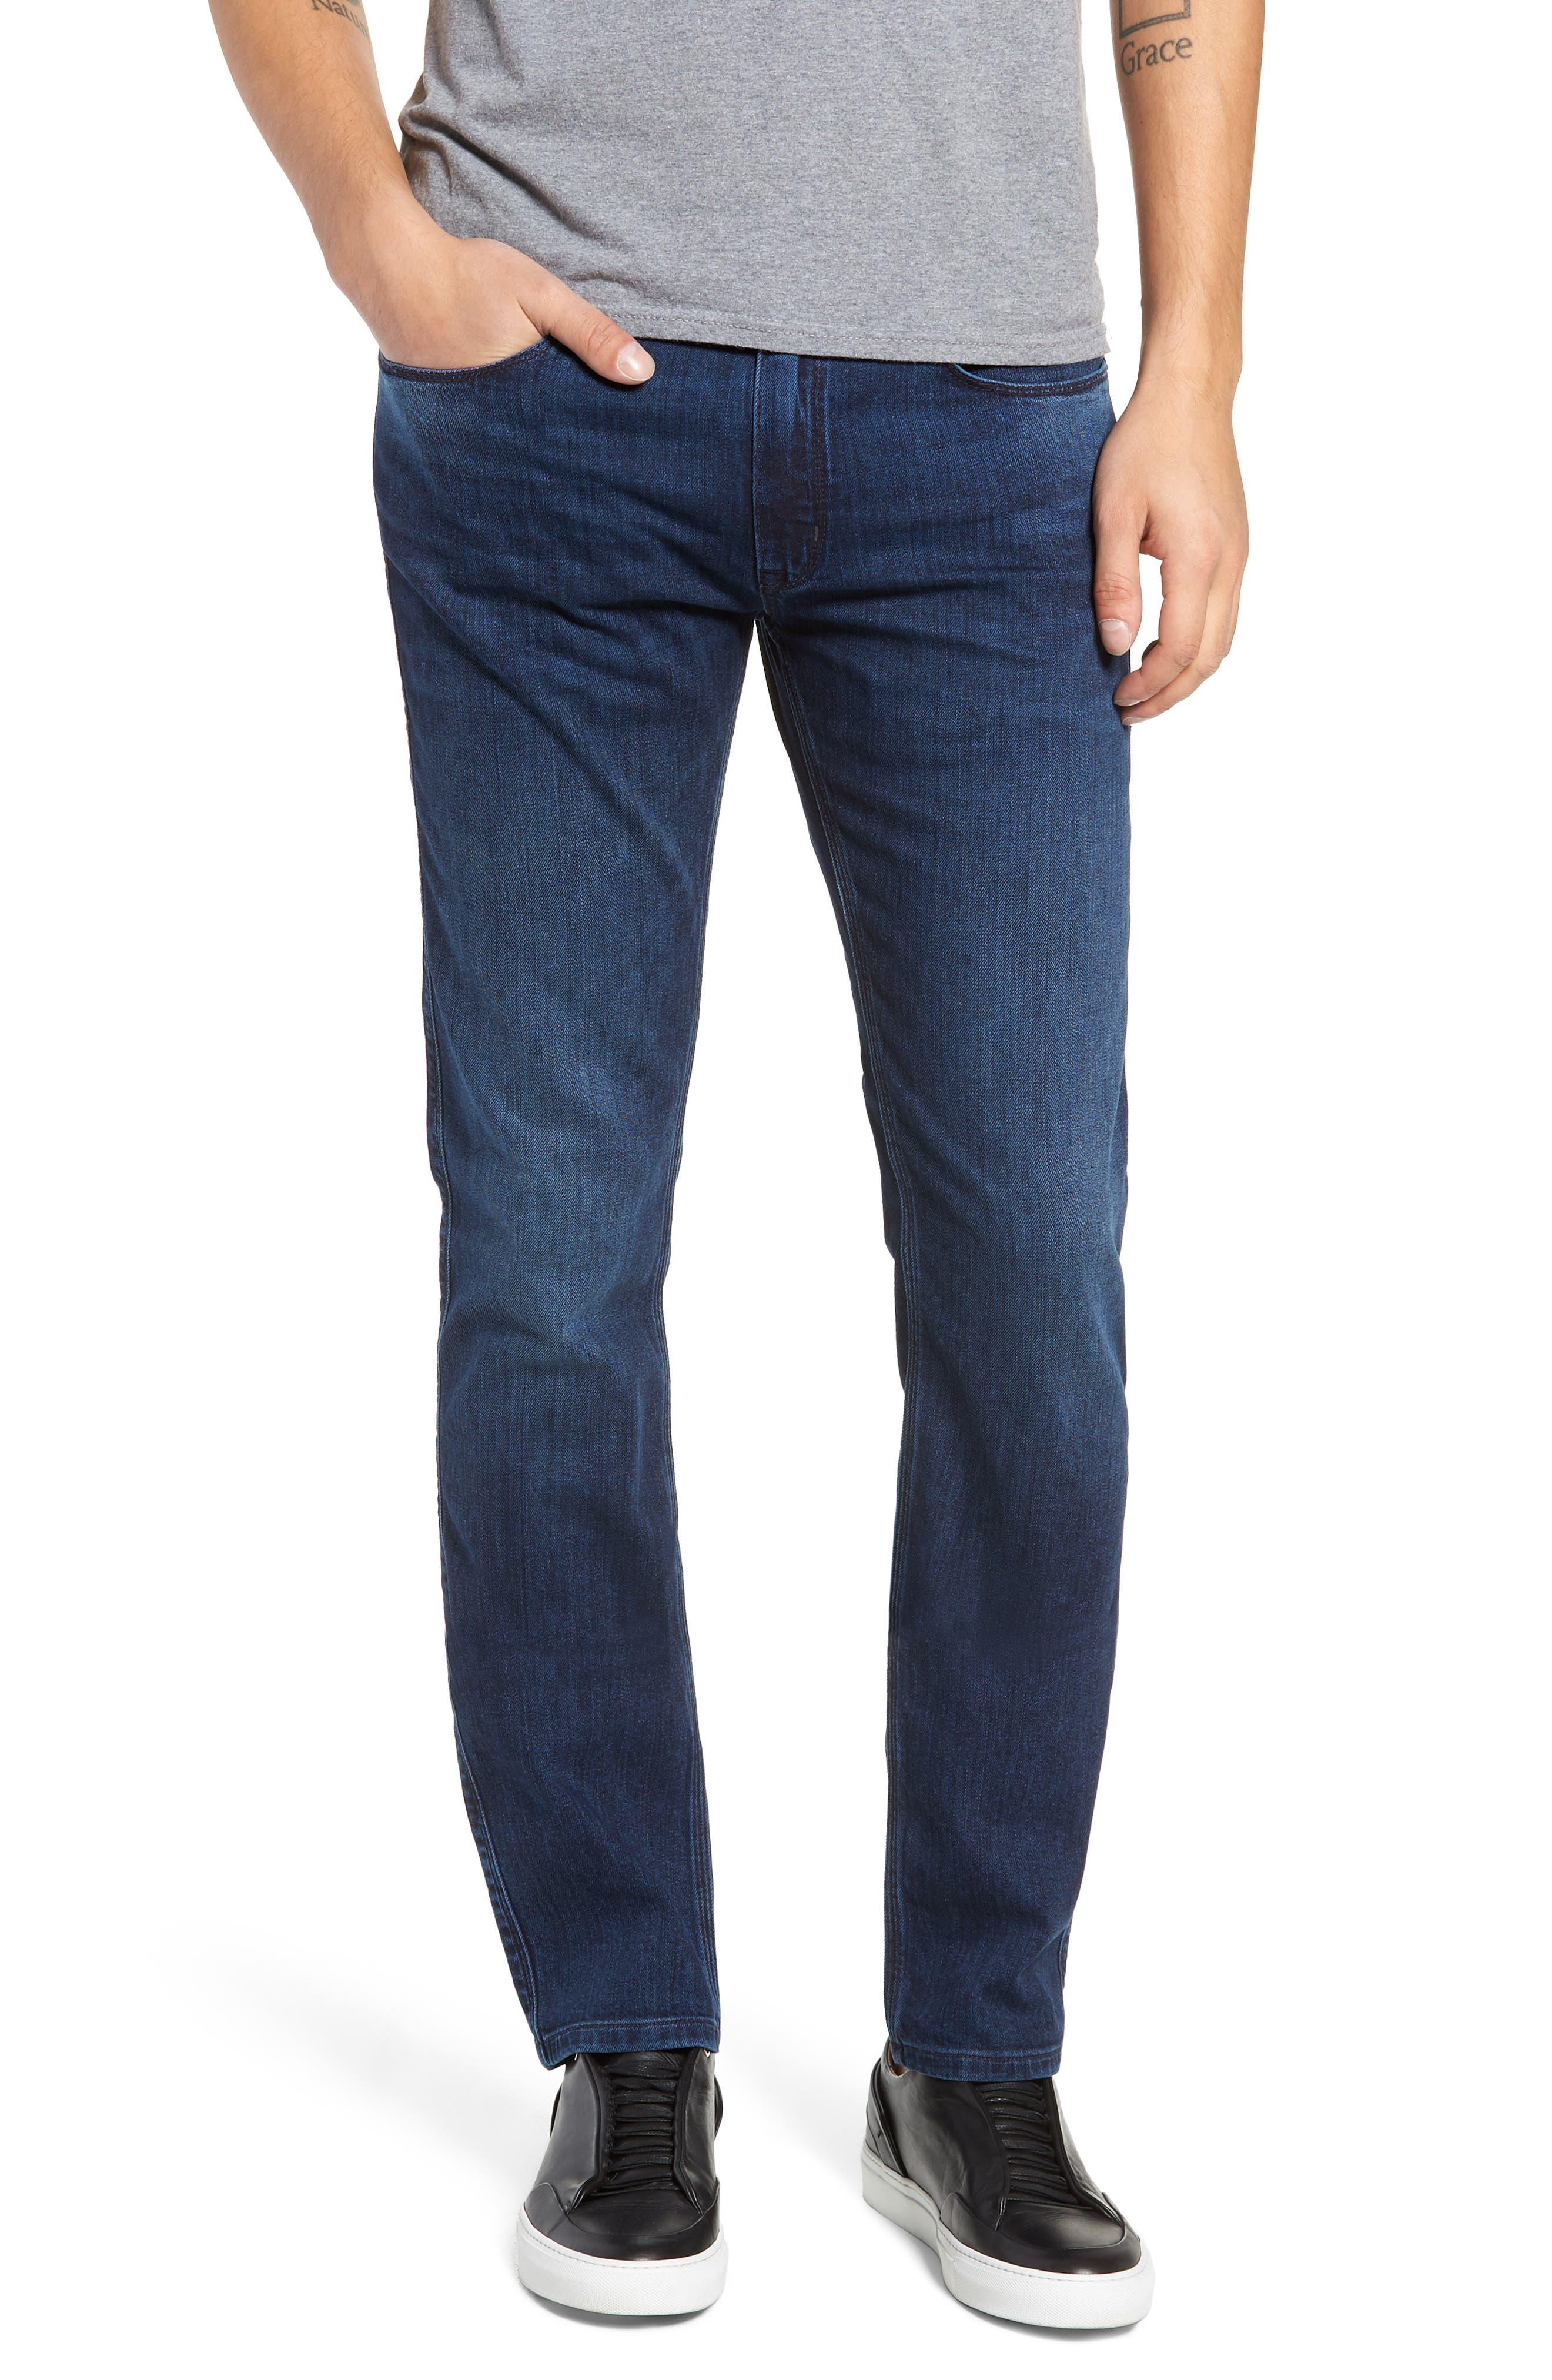 708 Stretch Slim Fit Jeans,                         Main,                         color, BLUE